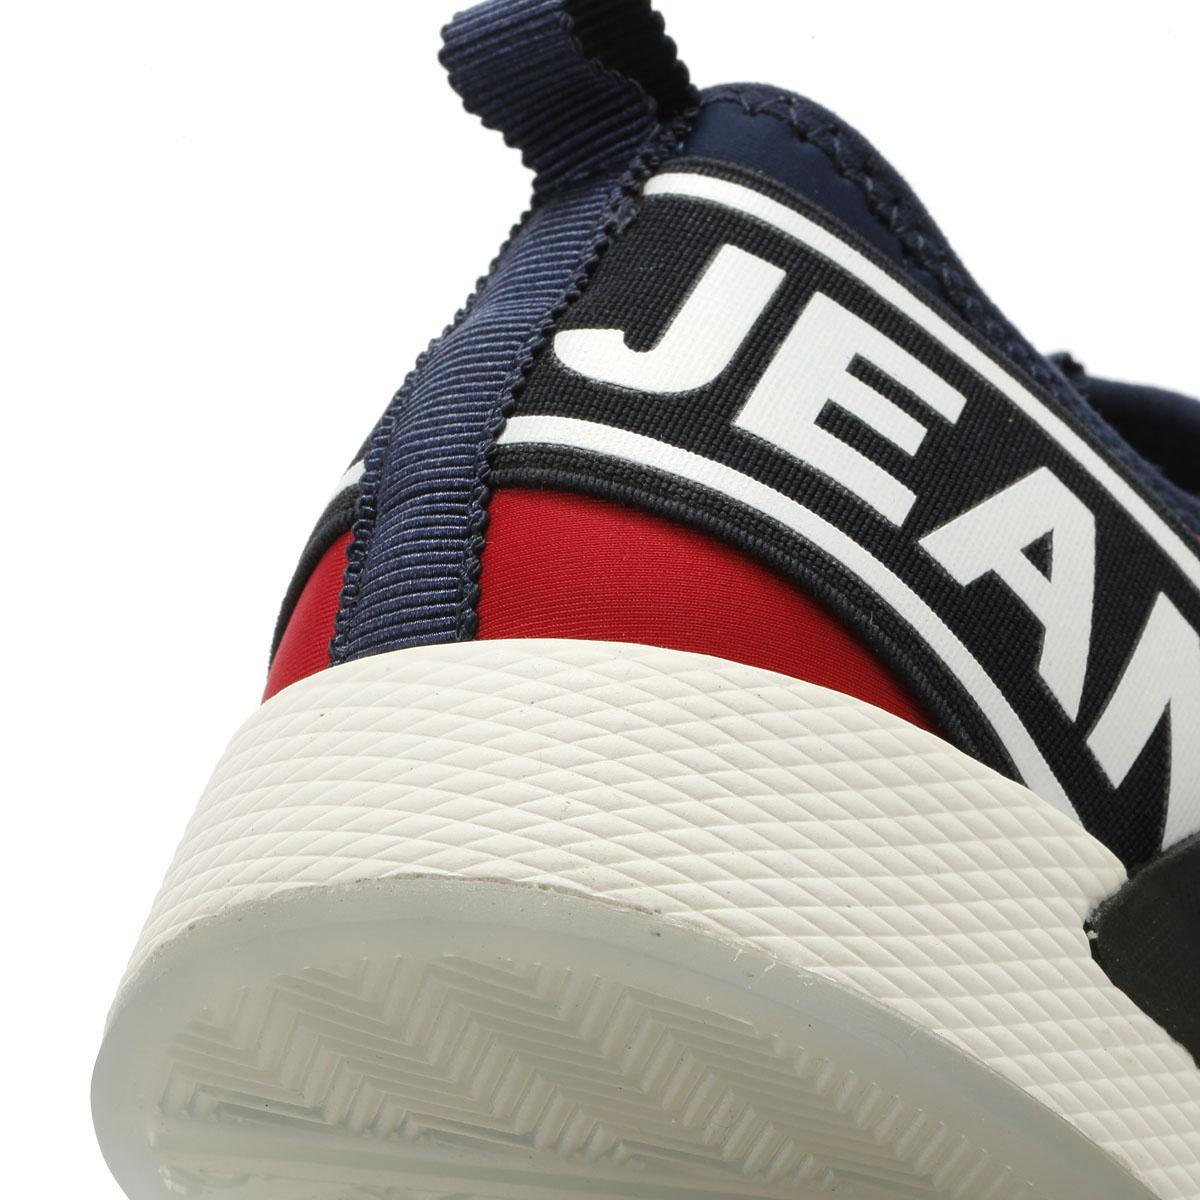 594306b66017 ... Tommy Jeans Flexi Mens Rwb Trainers for Men - Lyst. View fullscreen